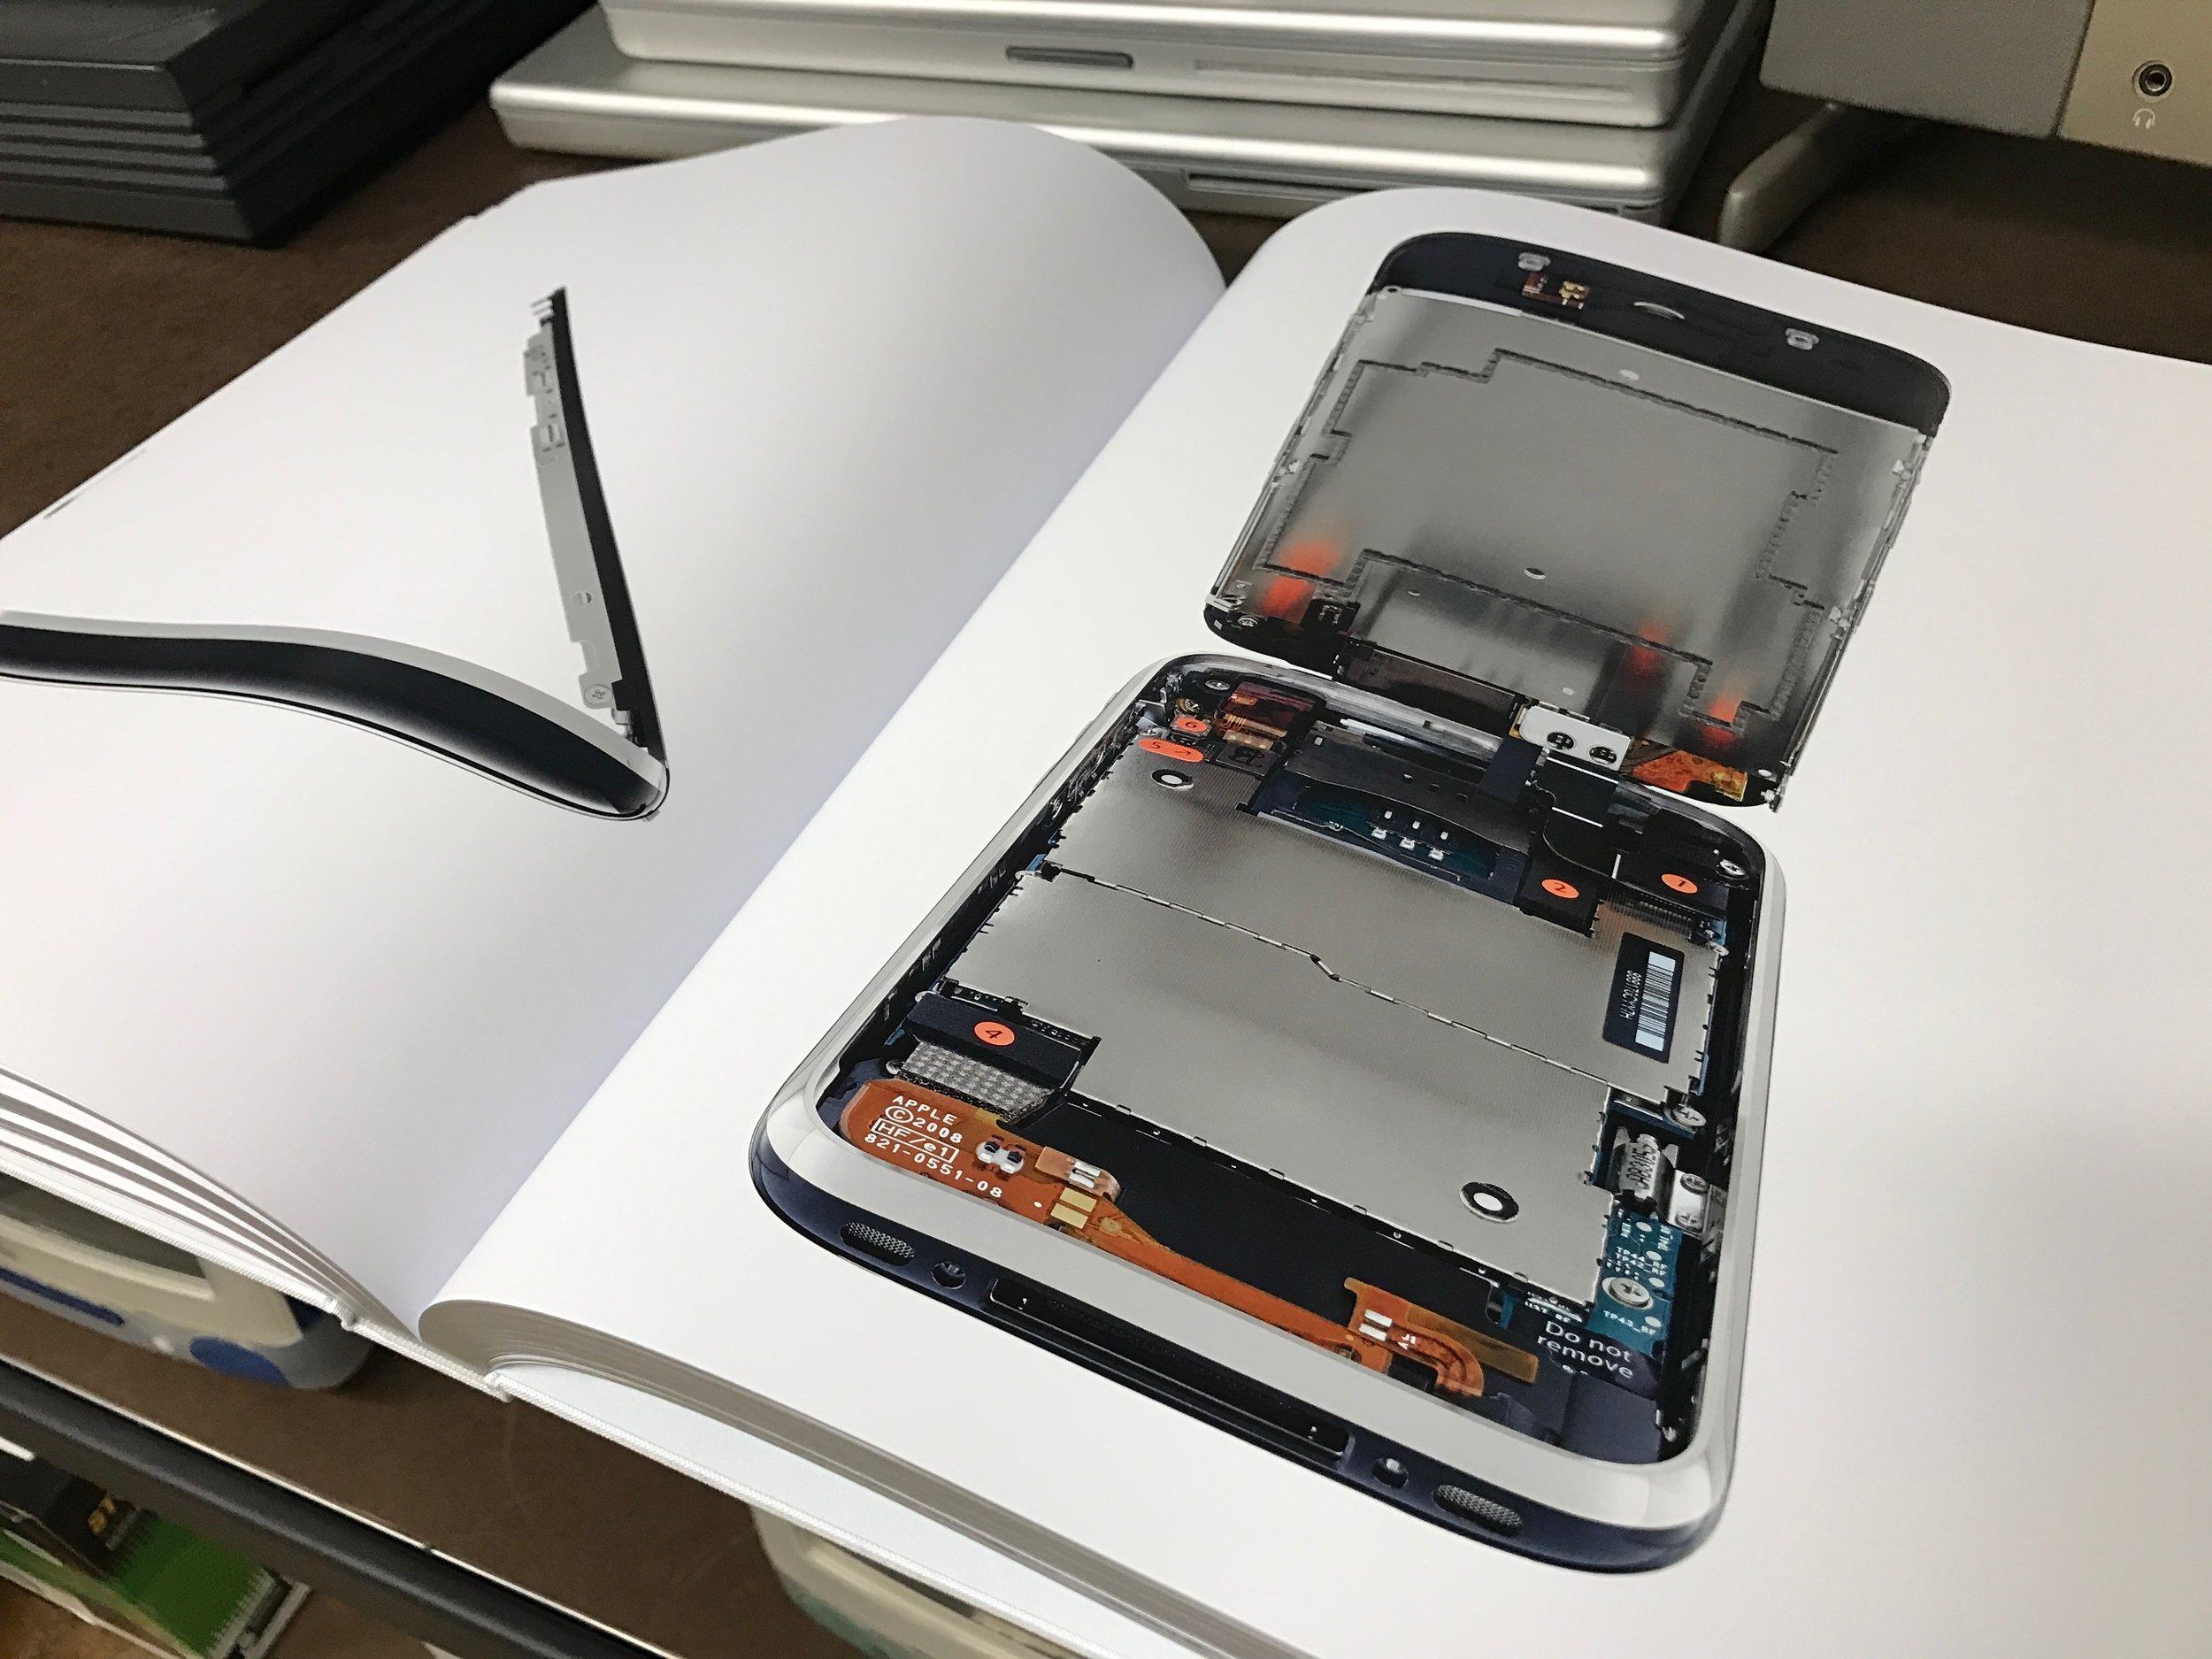 iPhone 3G internals